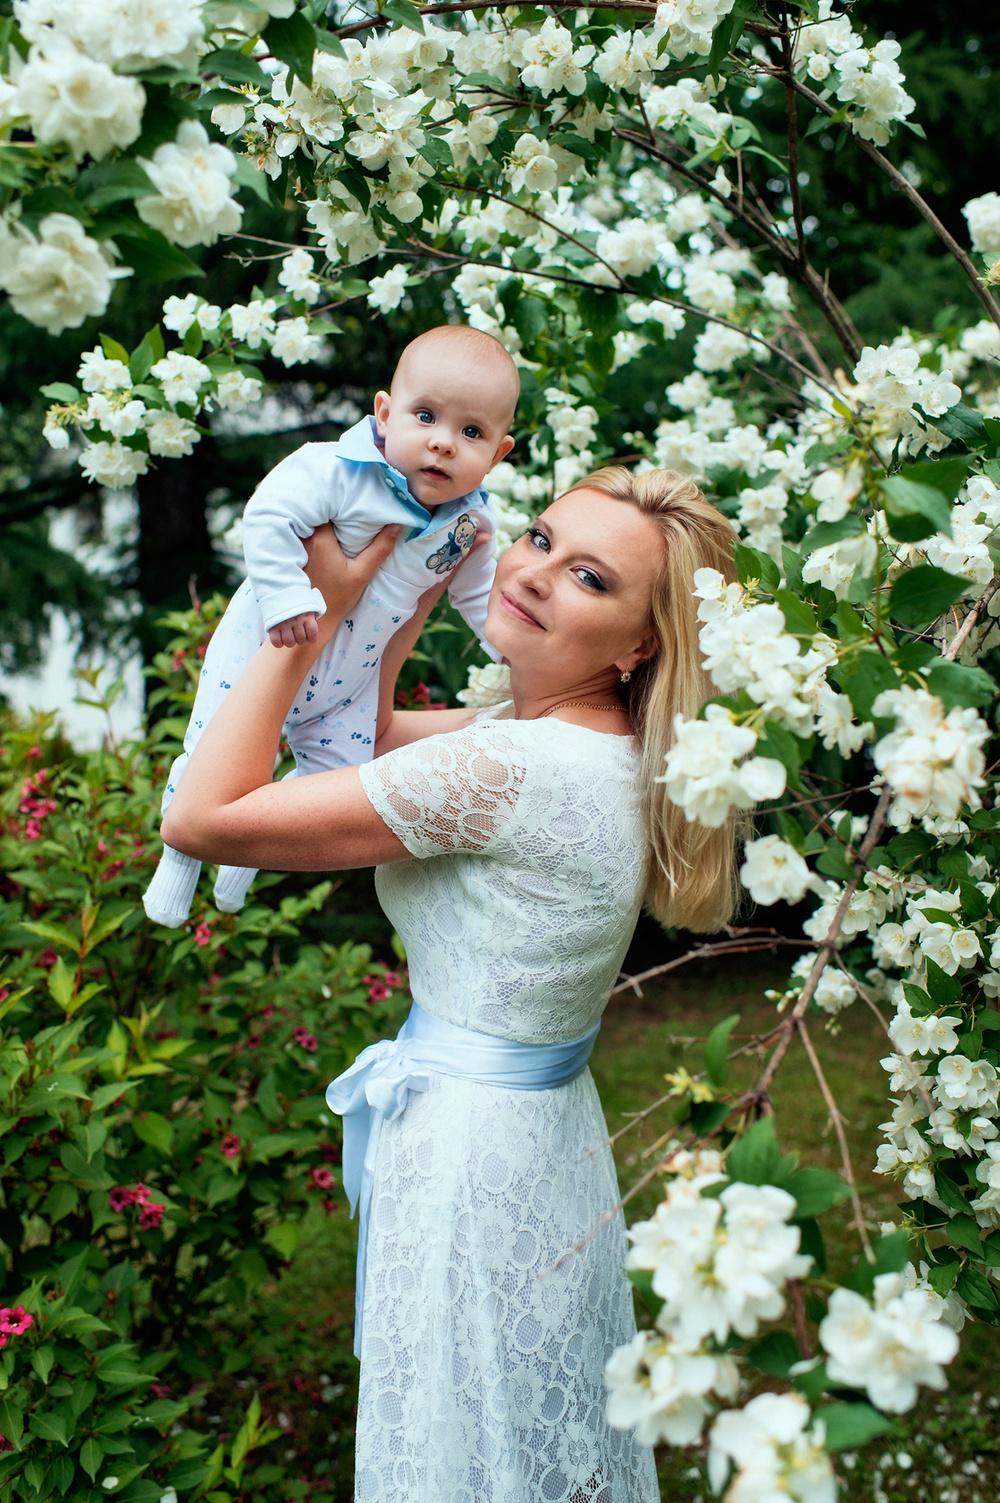 мама и дитя